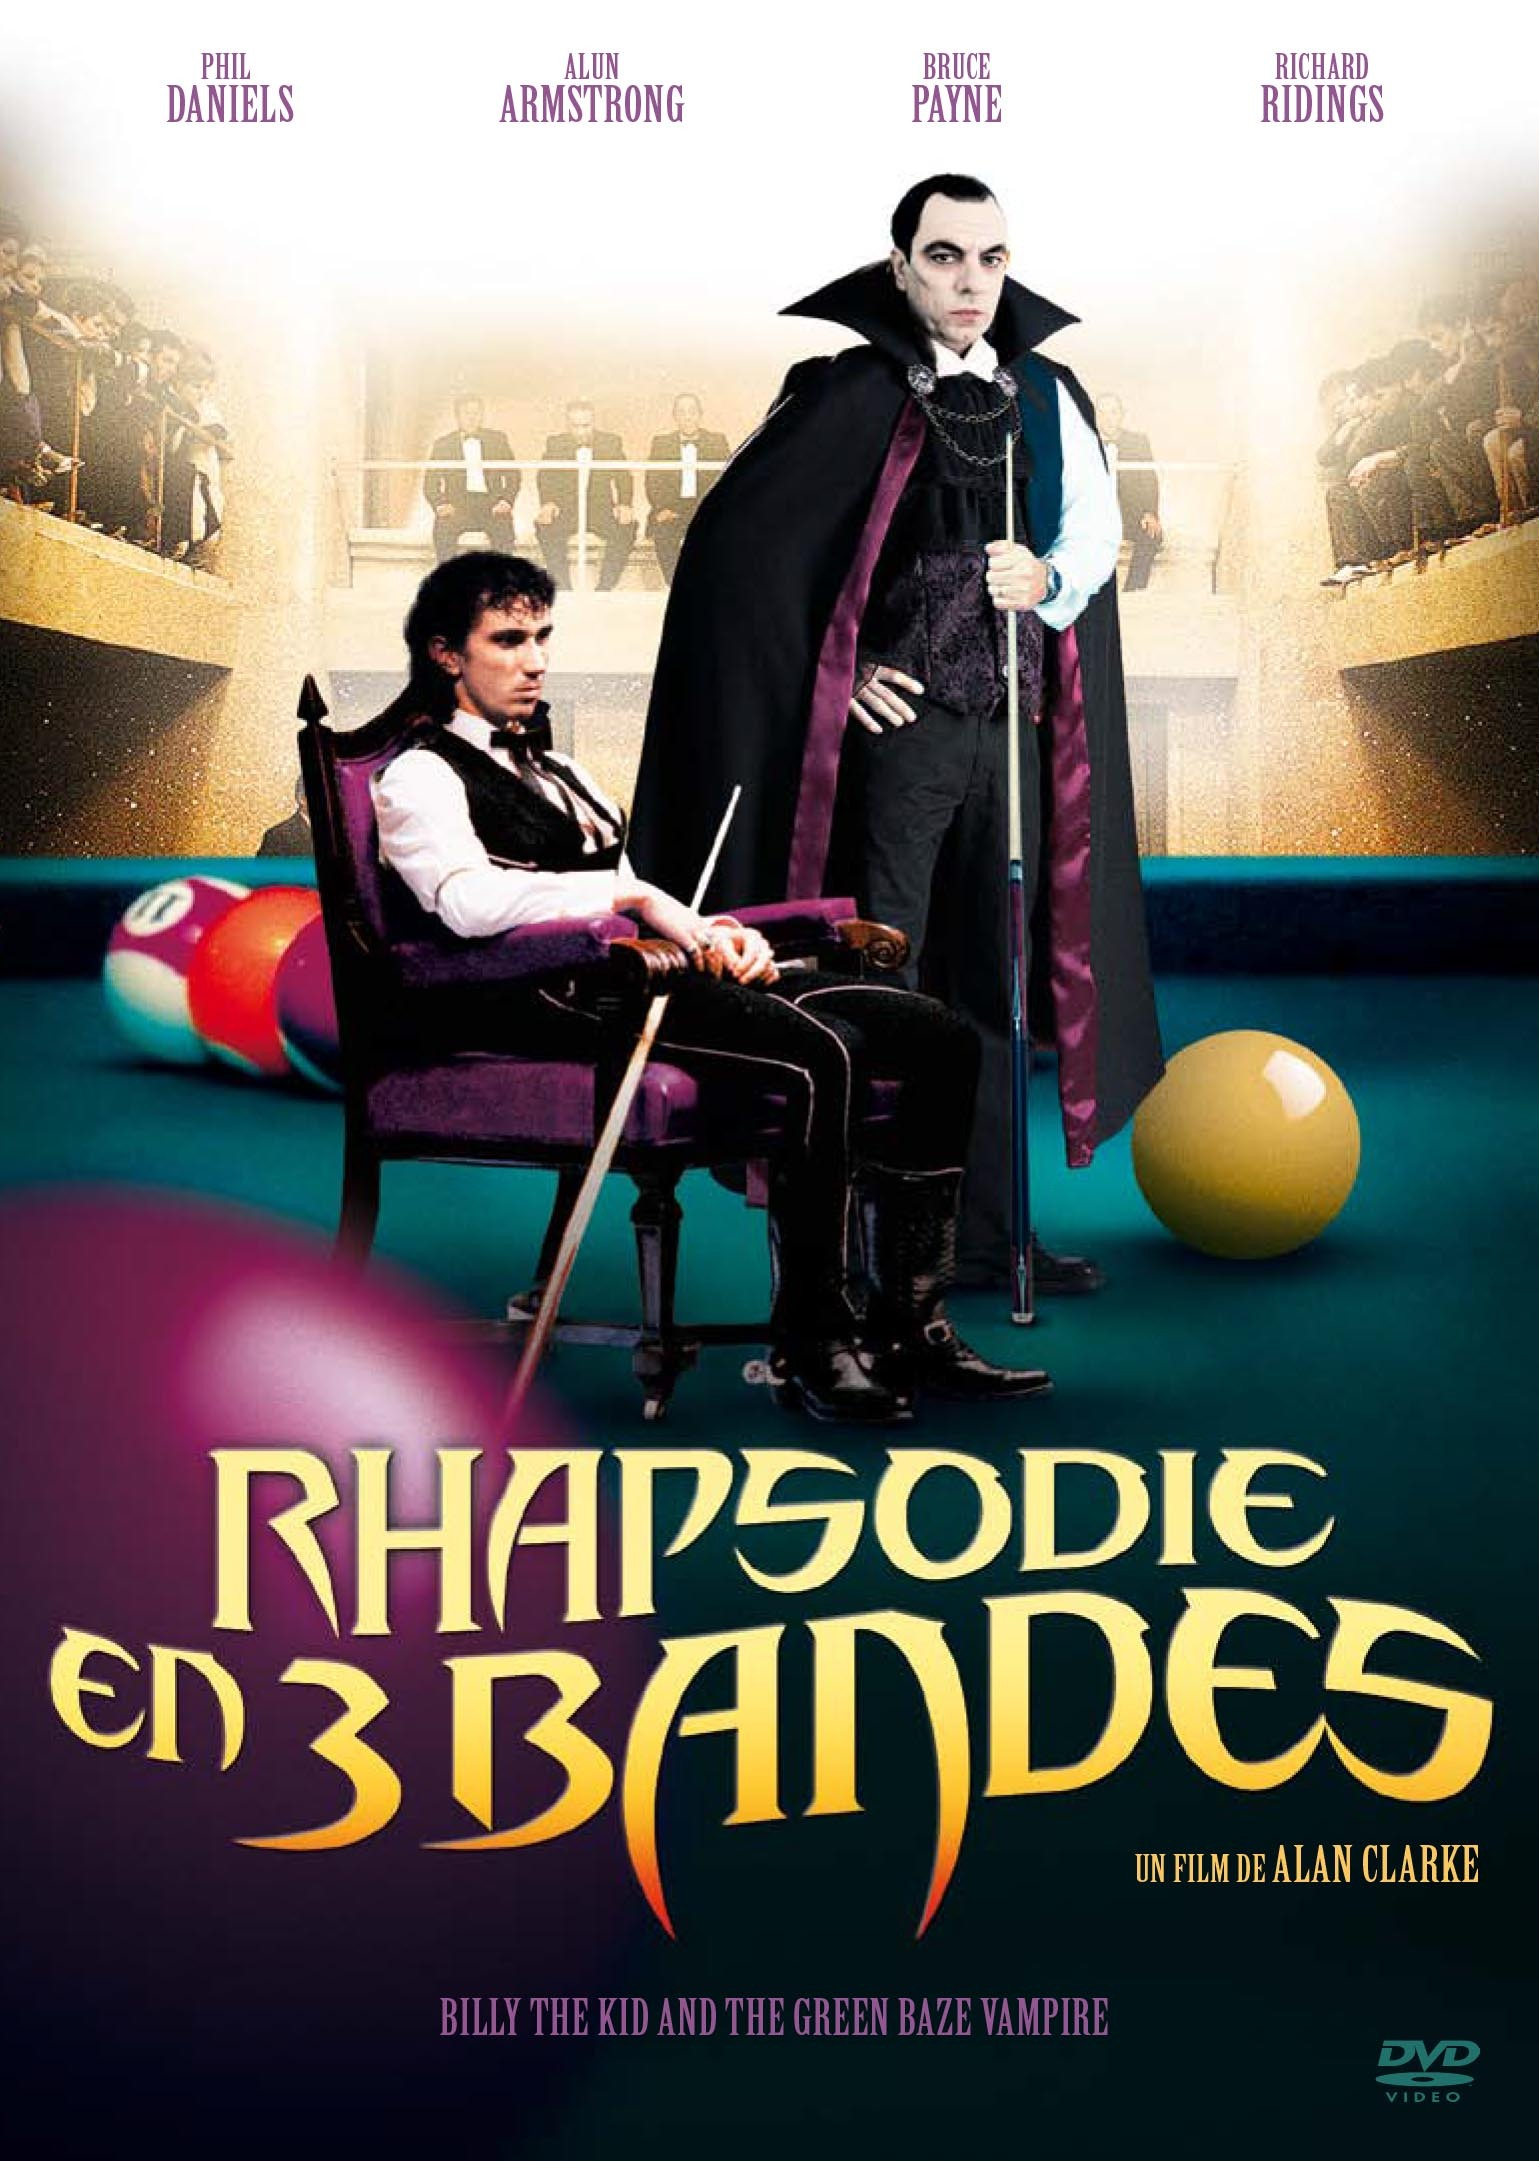 RHAPSODIE EN 3 BANDES - DVD